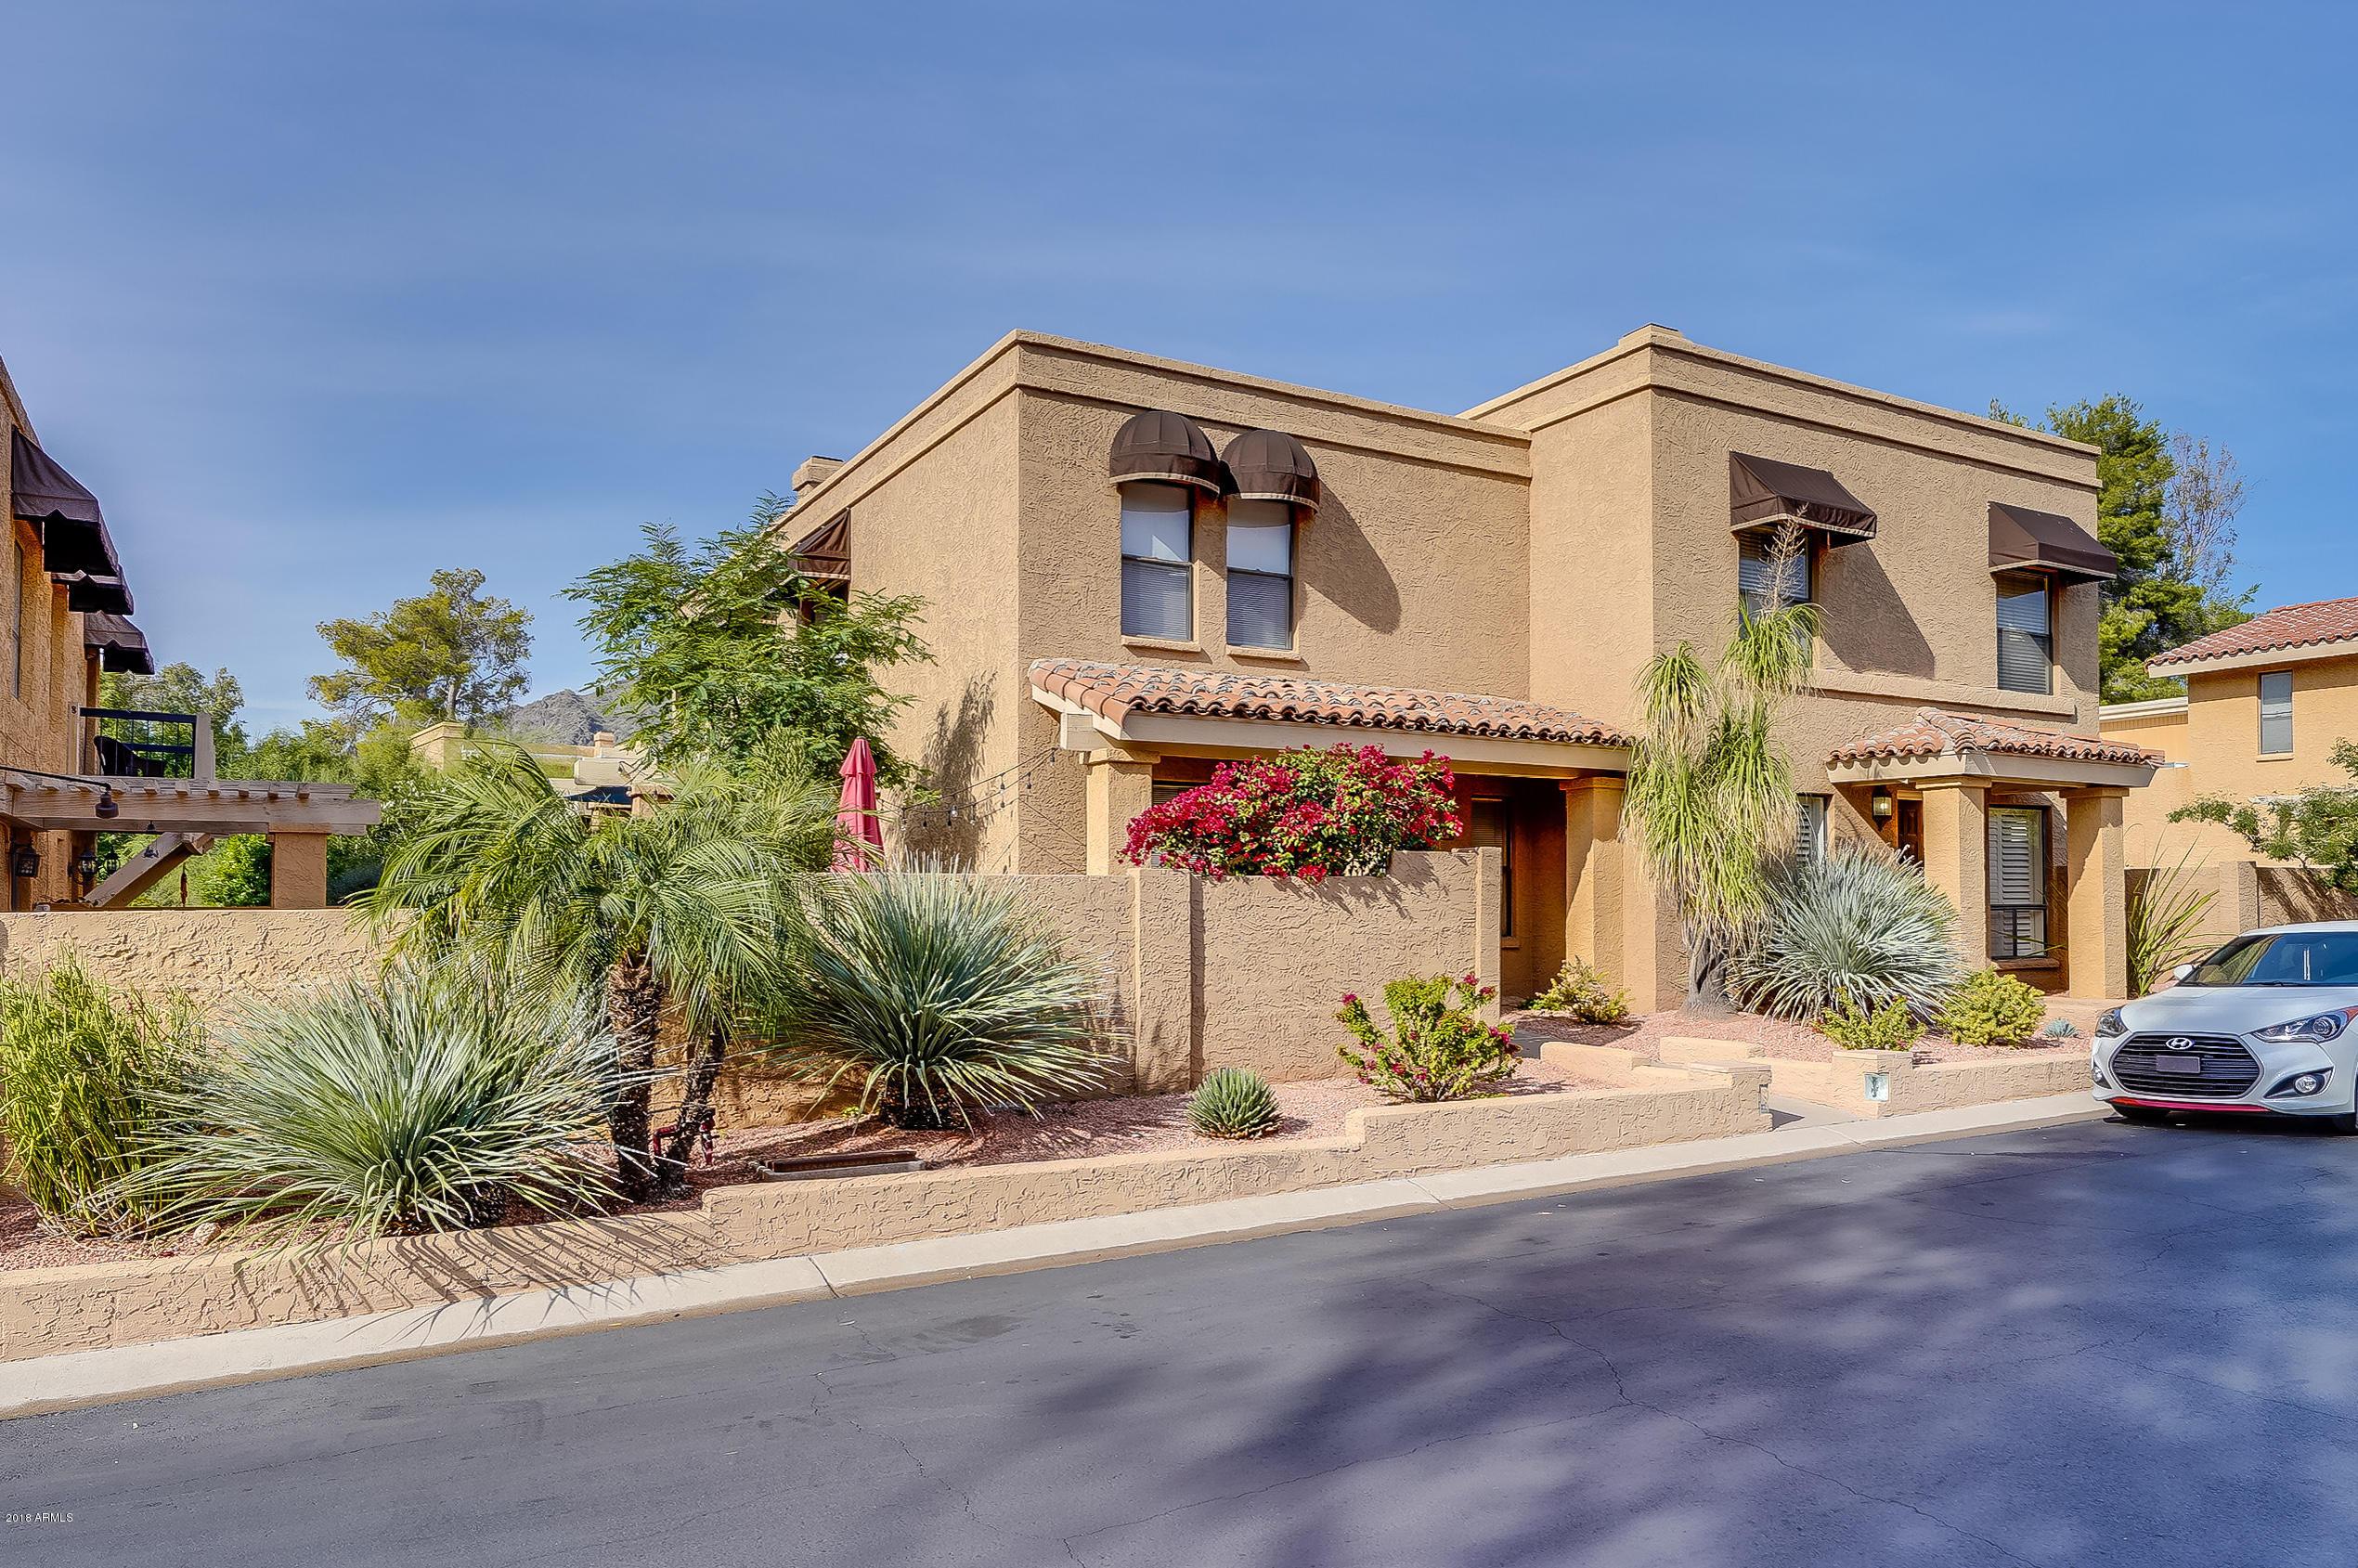 Photo of 10420 N 11TH Street #2, Phoenix, AZ 85020